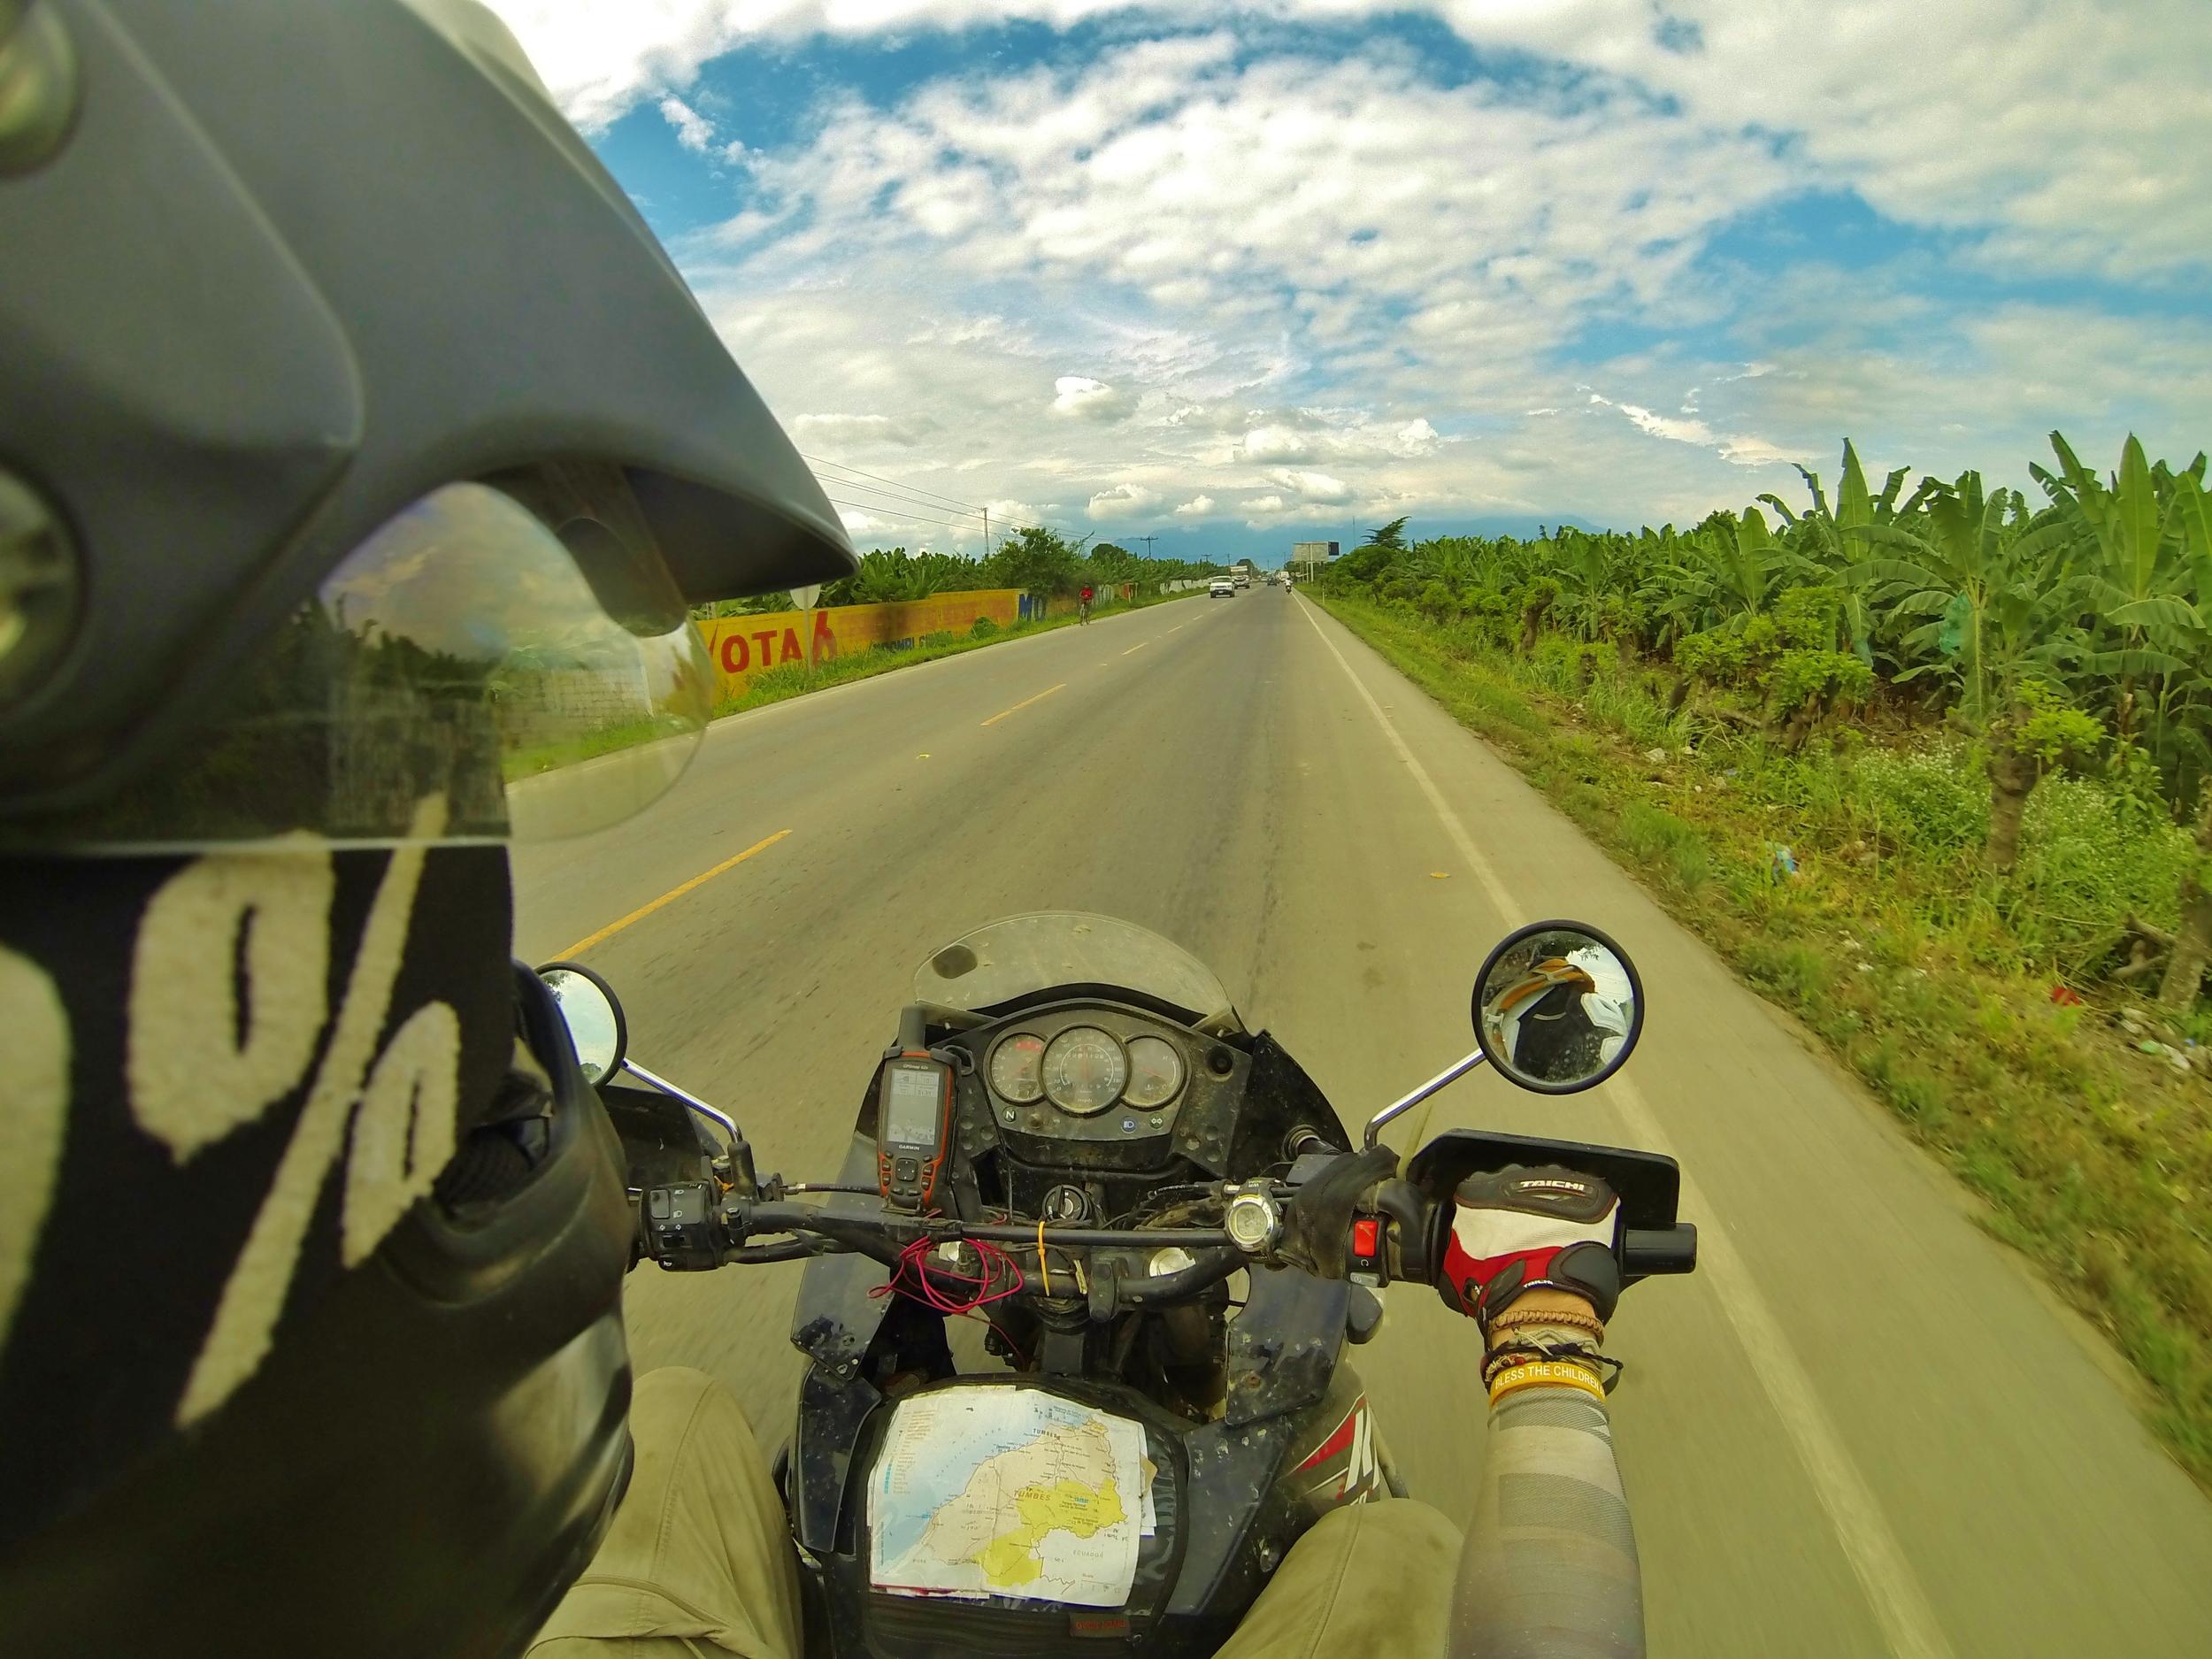 Southern Ecuador's primary motif: banana plantations